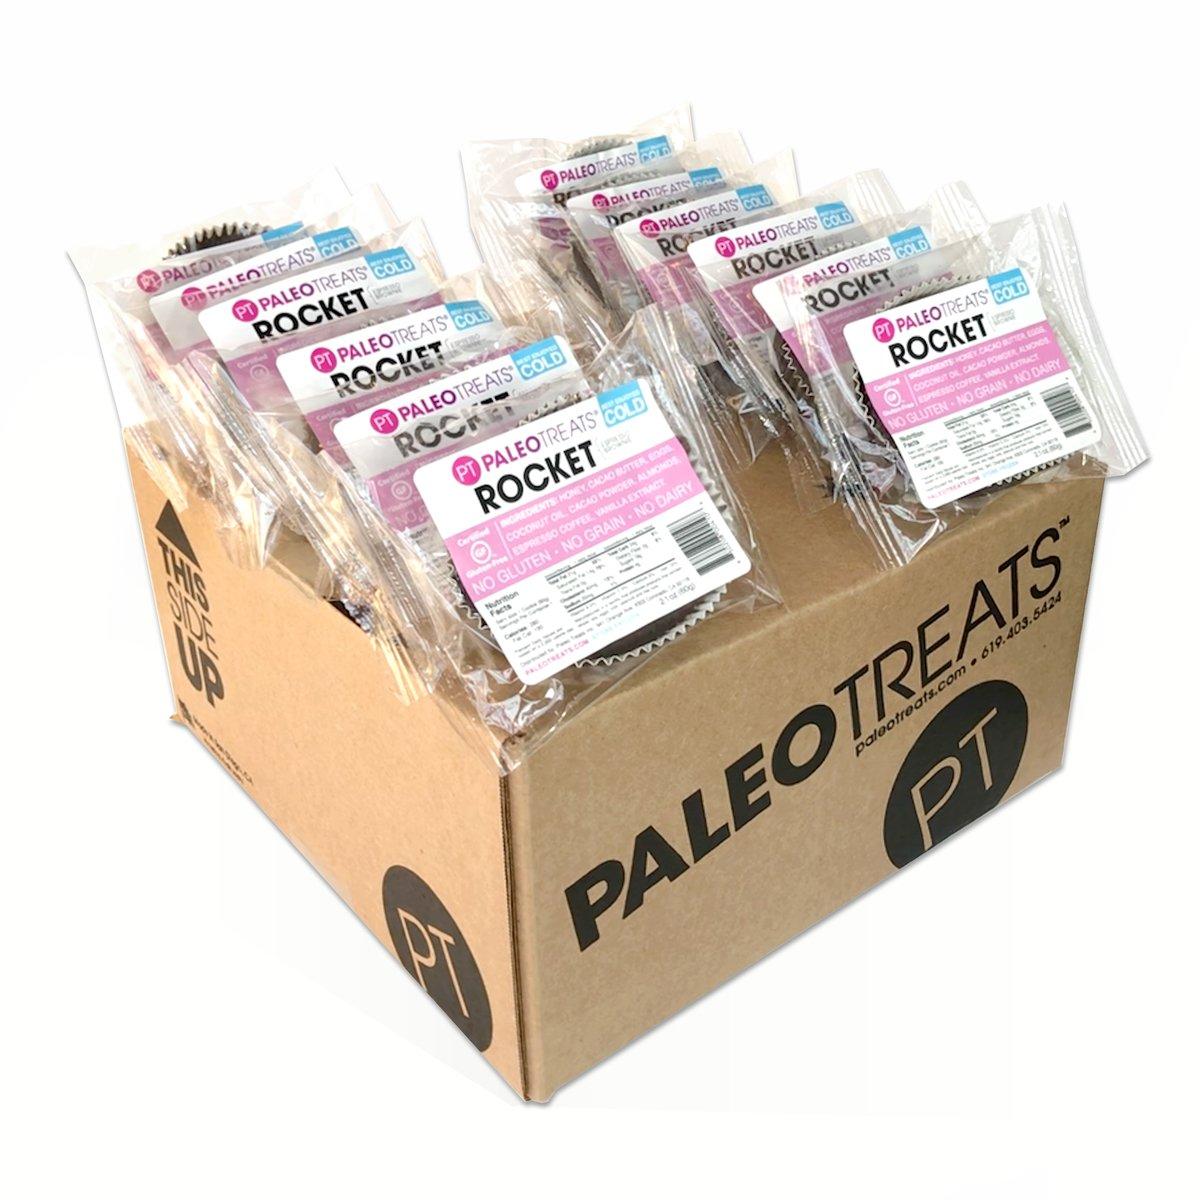 Paleo Treats Rocket: Paleo cookie, Gluten-Free, Grain-Free, Dairy-Free, Soy-Free, Real Food Dessert (Box of 12)